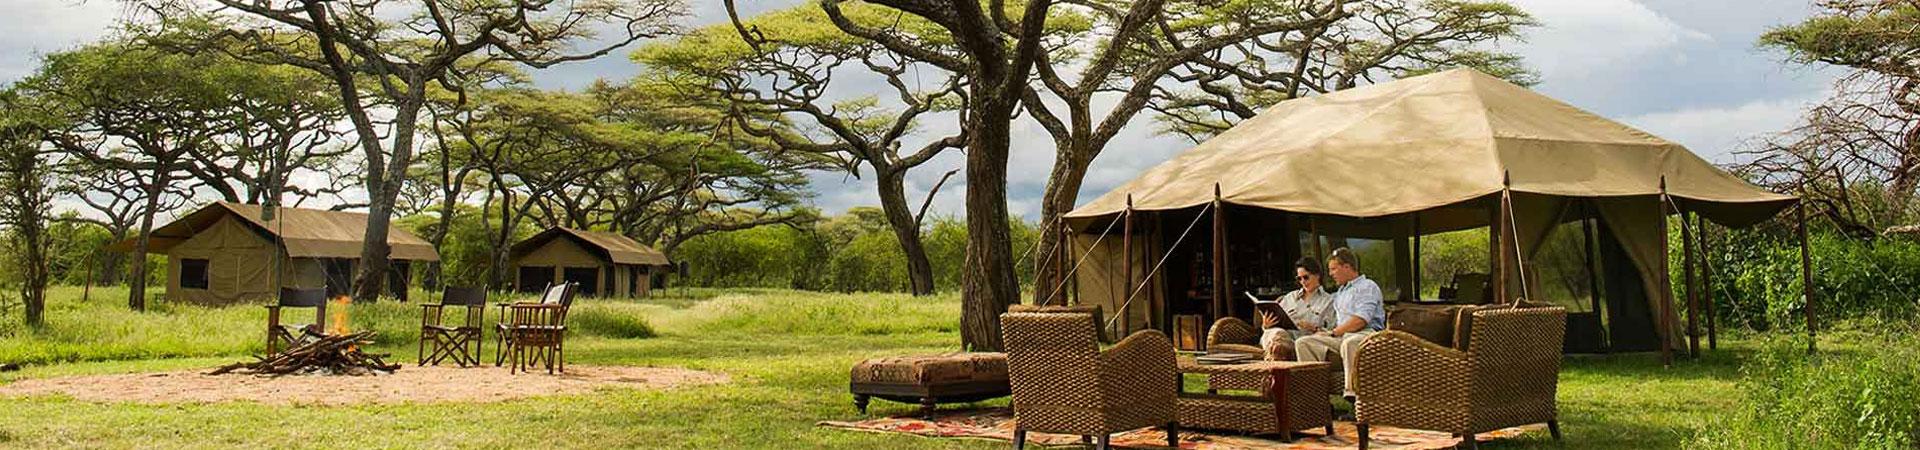 5-Camping-Tanzania-Safaris